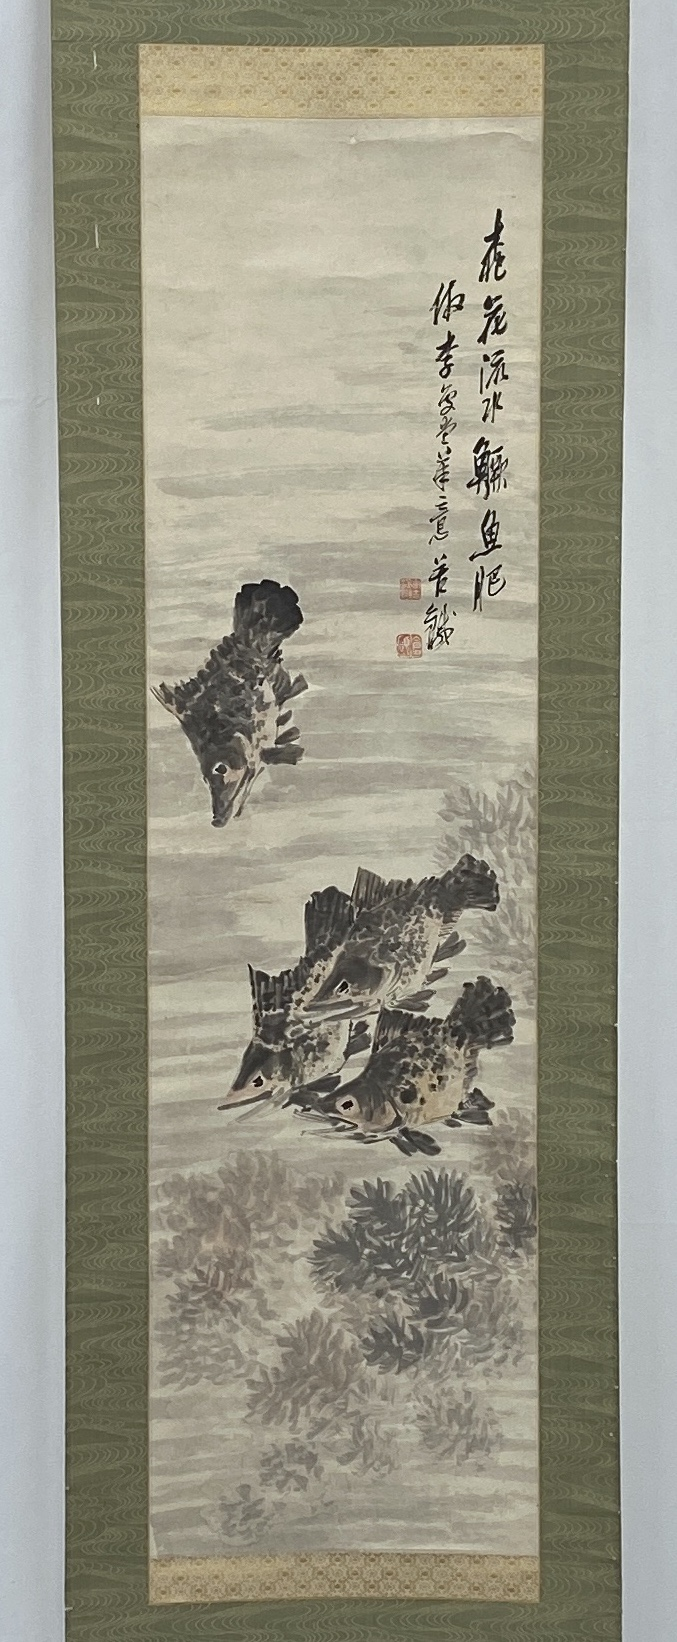 10334「呉昌碩」画 魚藻図 軸118.5×32.5cm